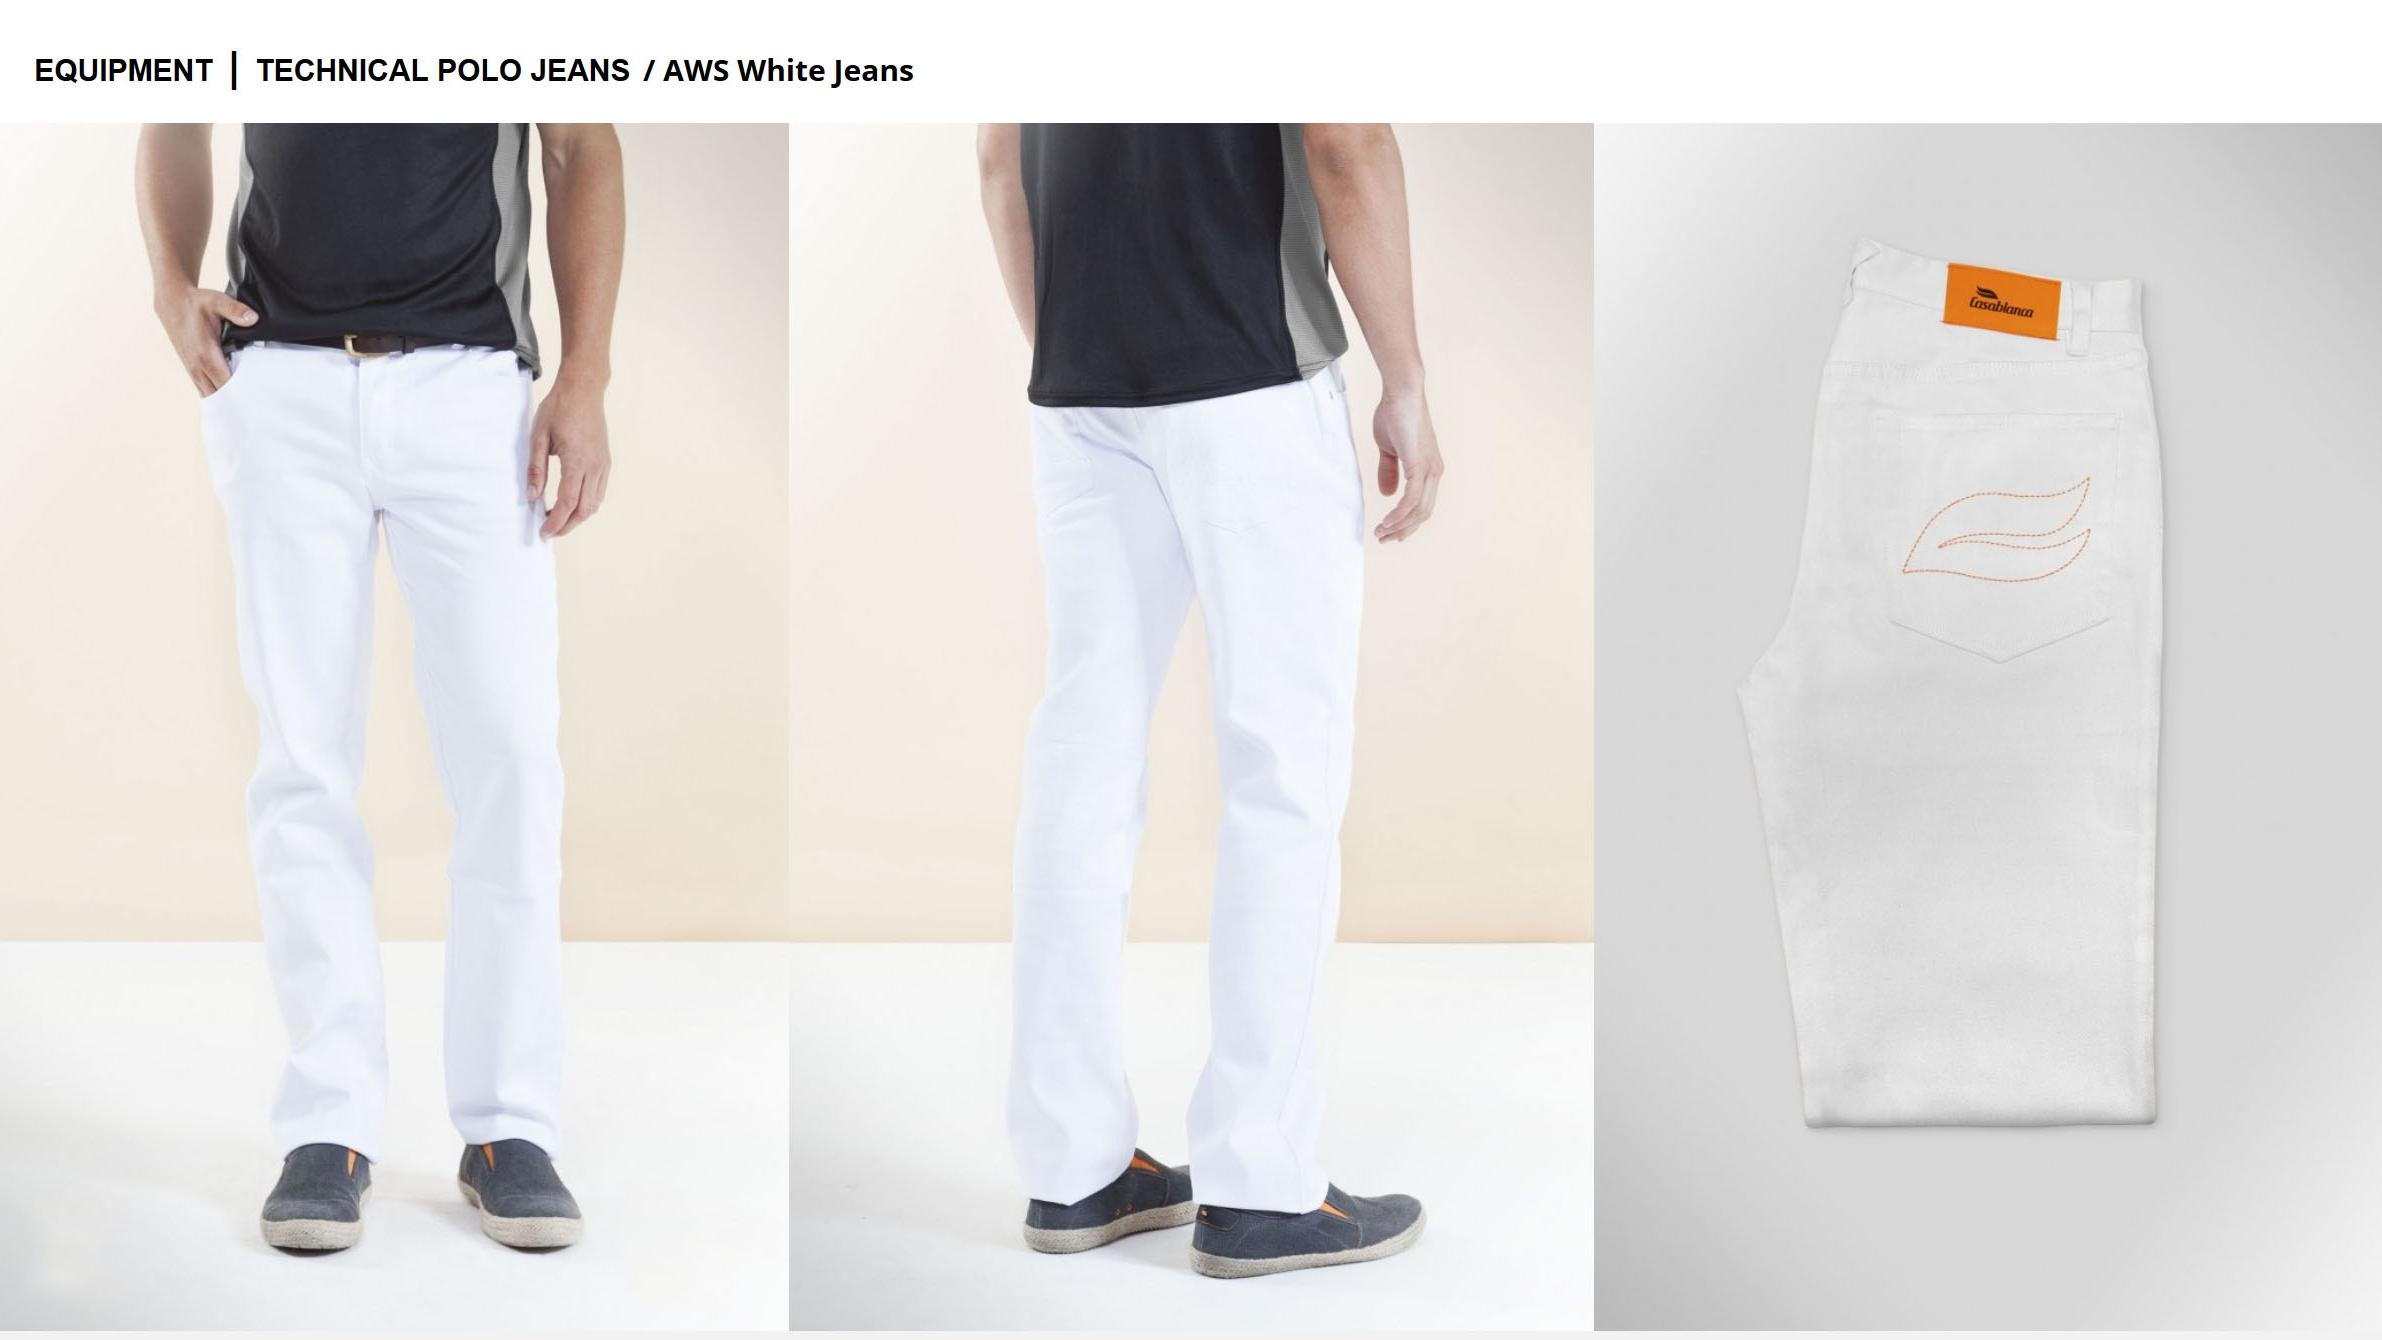 Casablanca_Polo Jeans.jpg